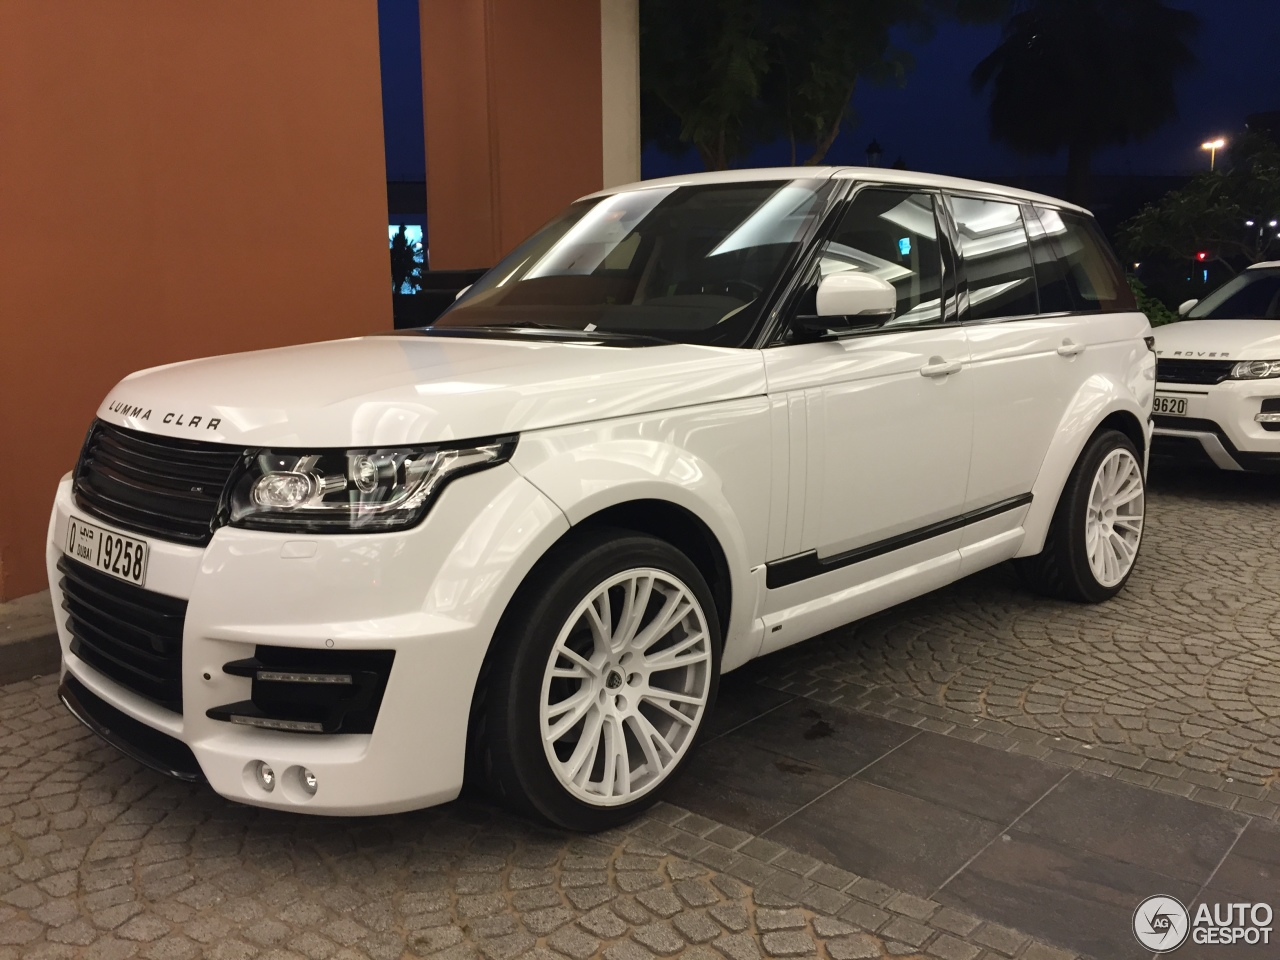 Matte White Land Rover >> Land Rover Range Rover Lumma CLR R - 1 July 2015 - Autogespot